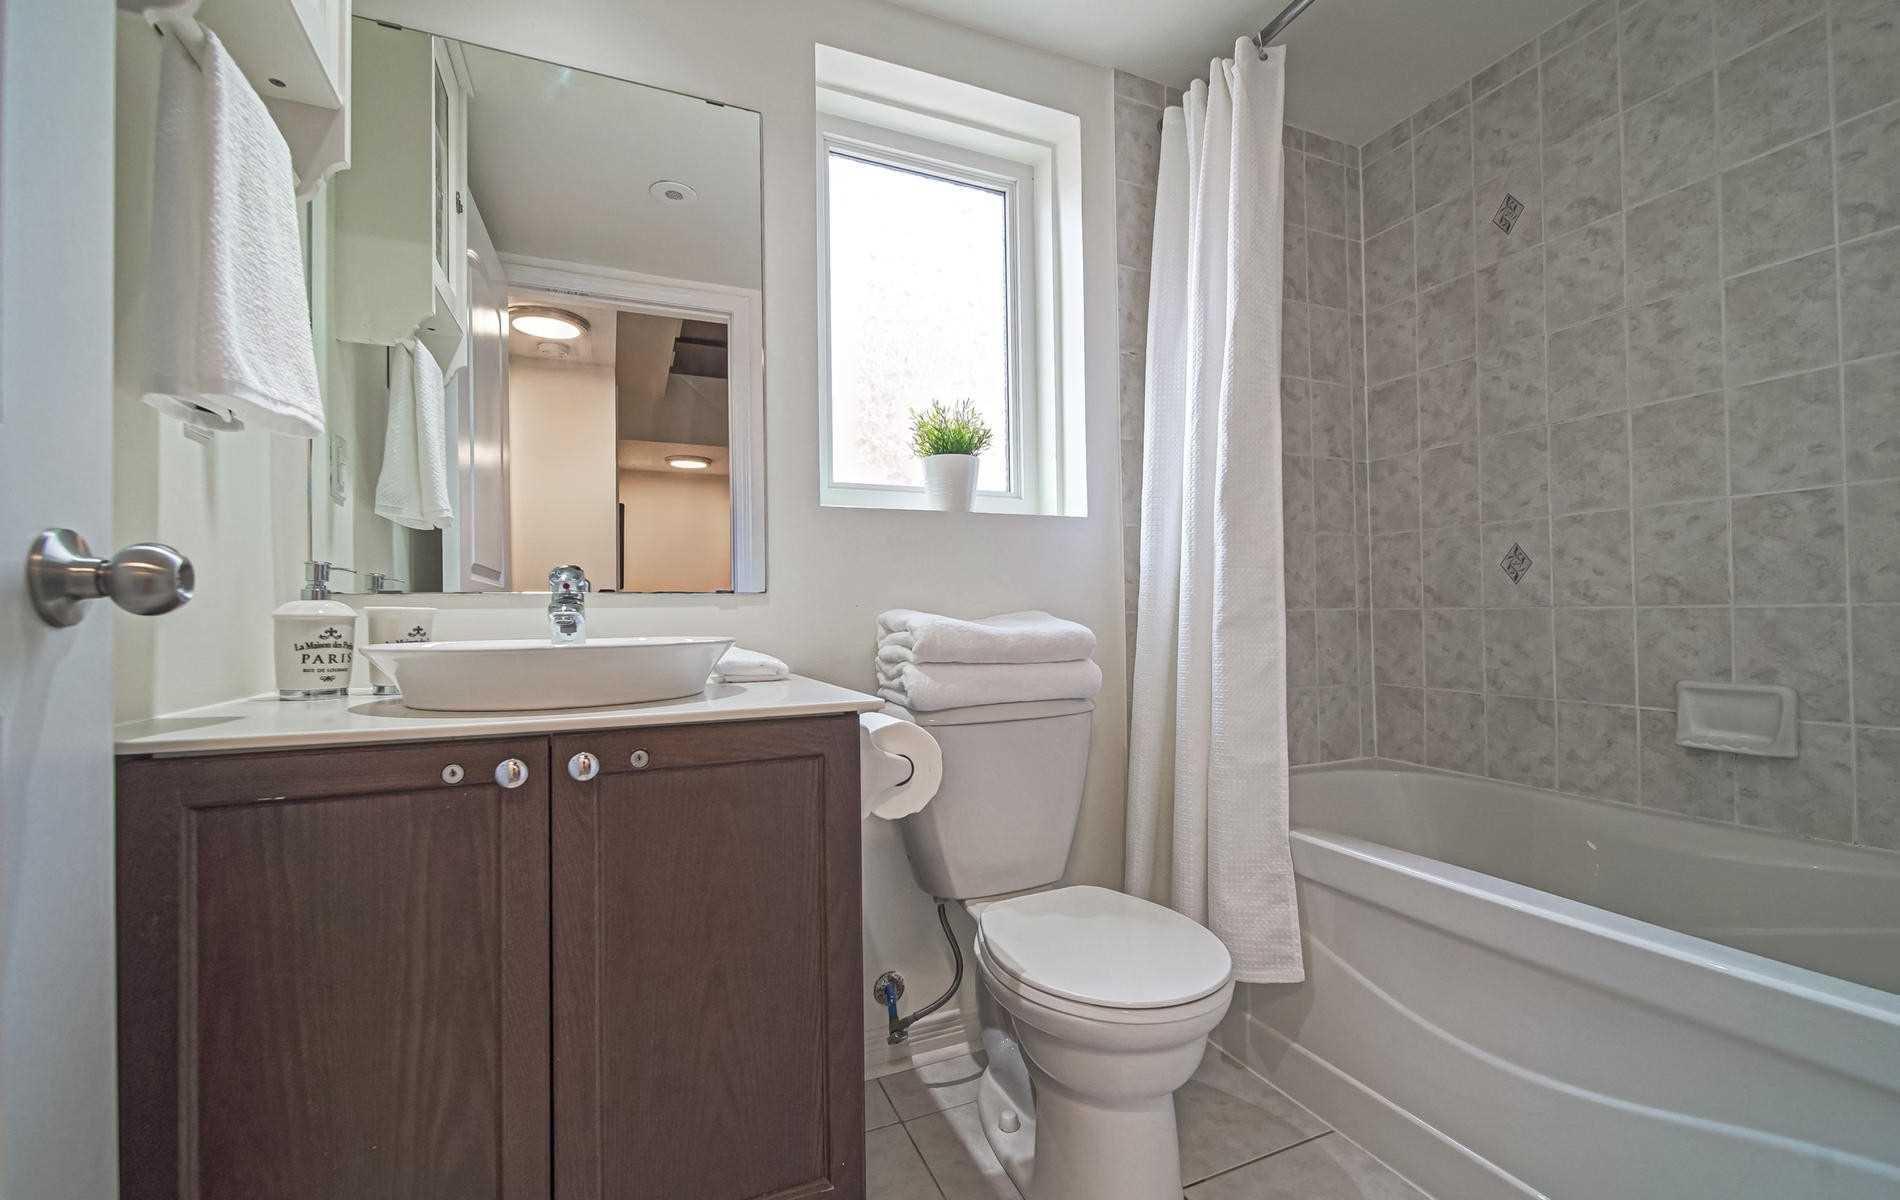 Photo 13: Photos: 3 78 Munro Street in Toronto: South Riverdale Condo for sale (Toronto E01)  : MLS®# E4615987